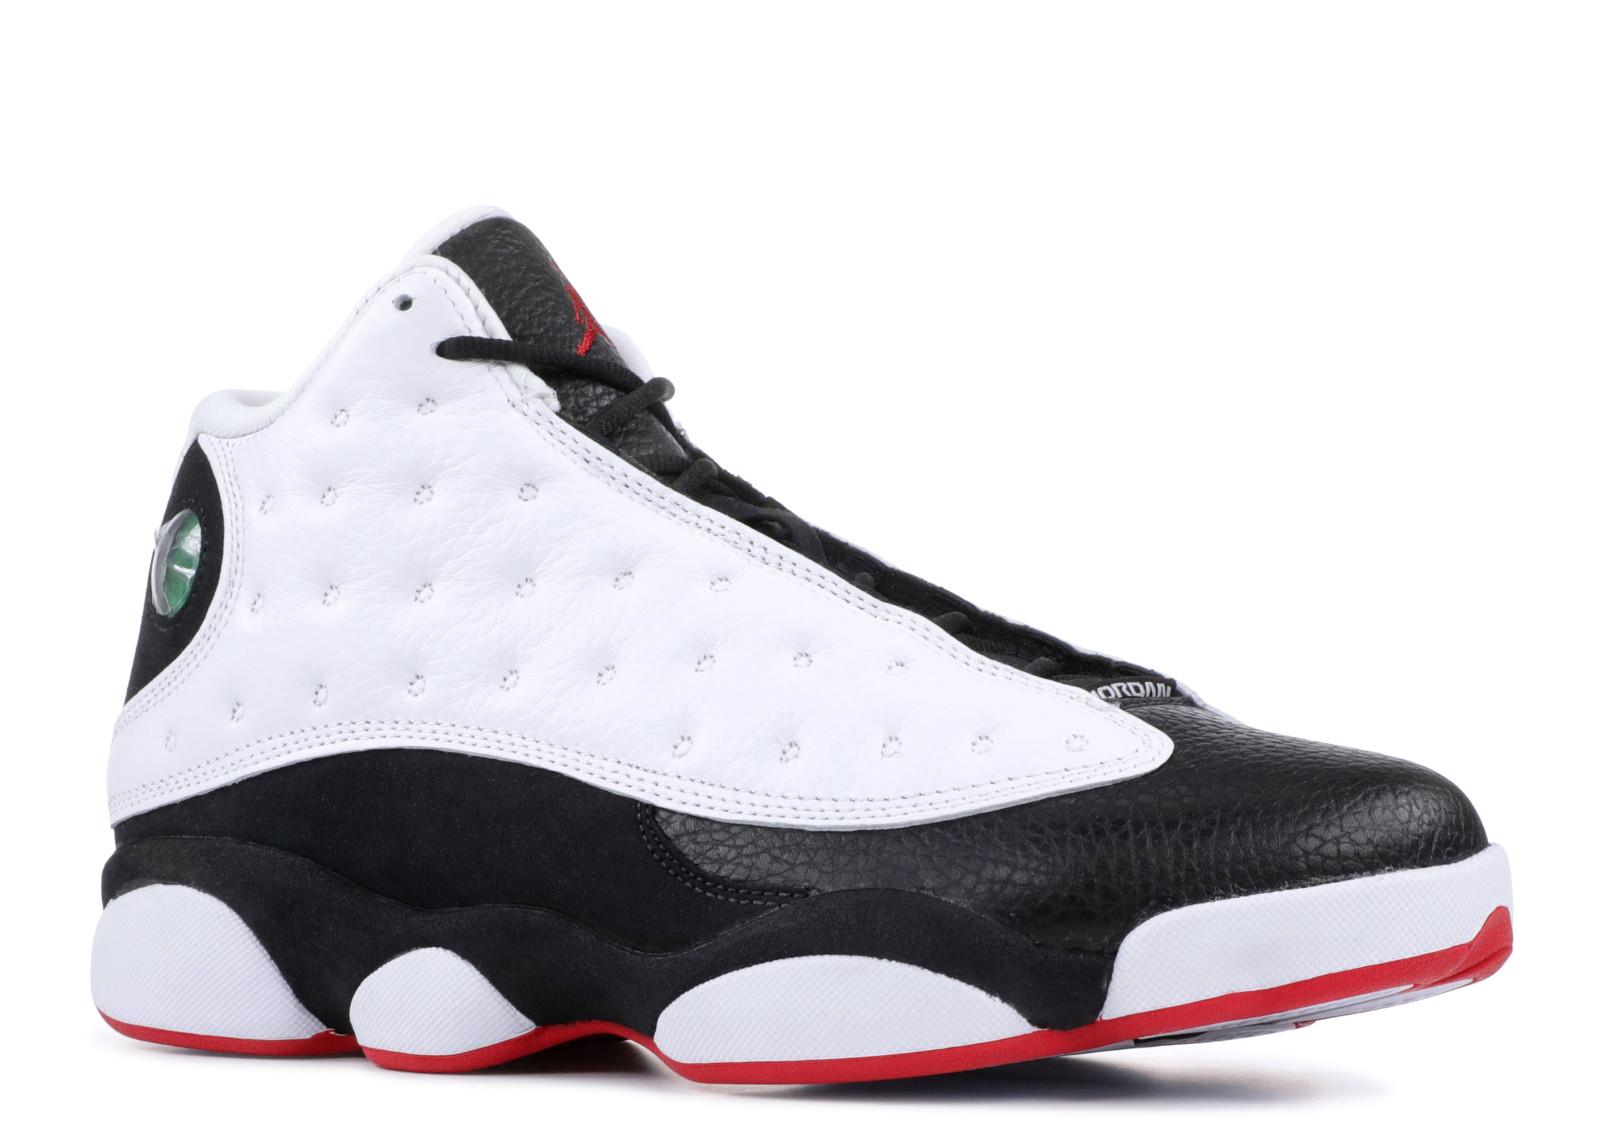 on sale 82ea7 05c60 Kick Avenue - Authentic Sneakers